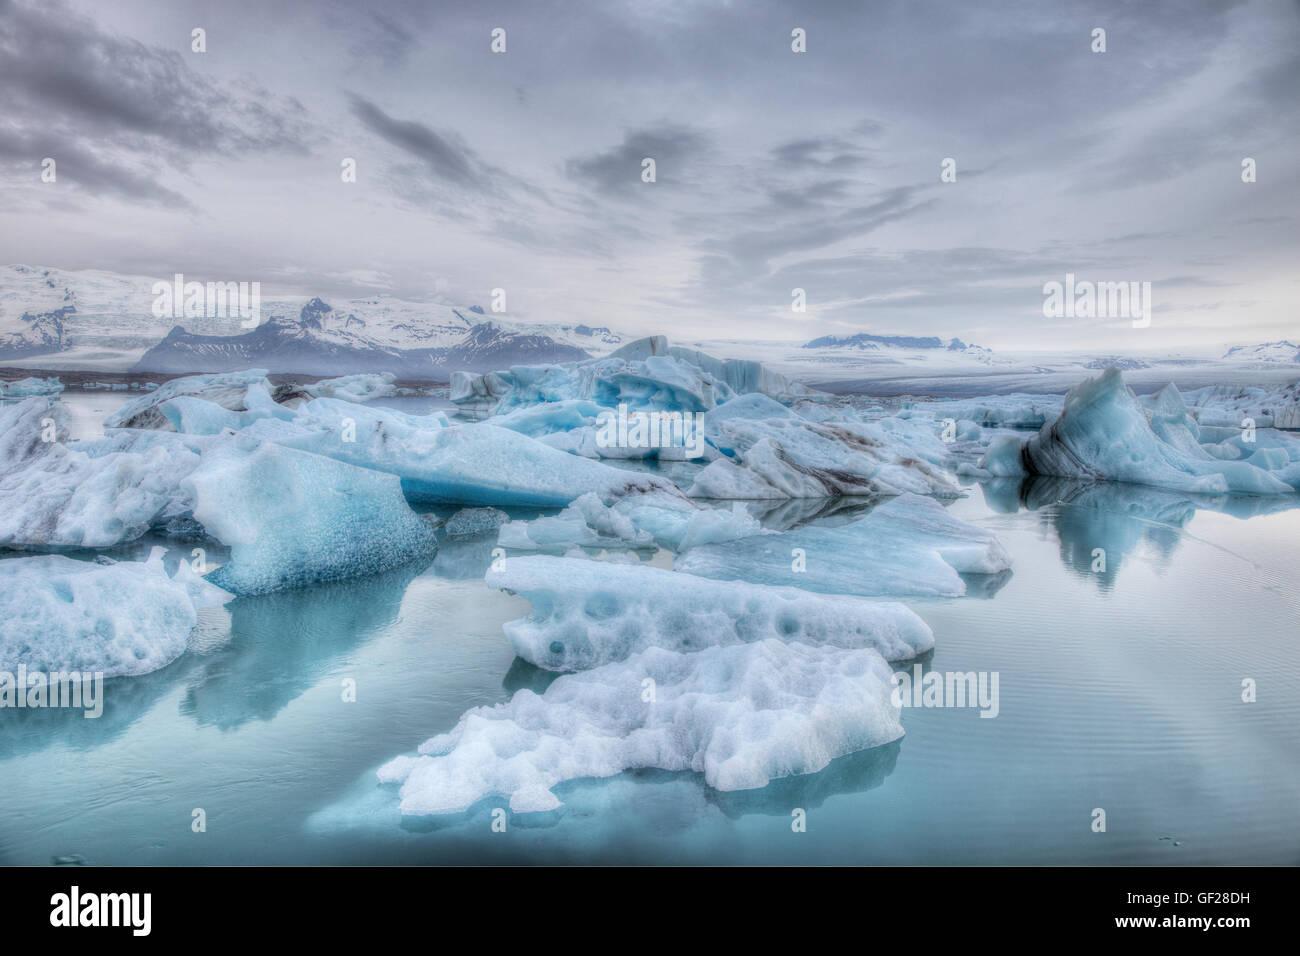 Les icebergs bleu lagon Jokulsarlon Islande LA009229 Photo Stock